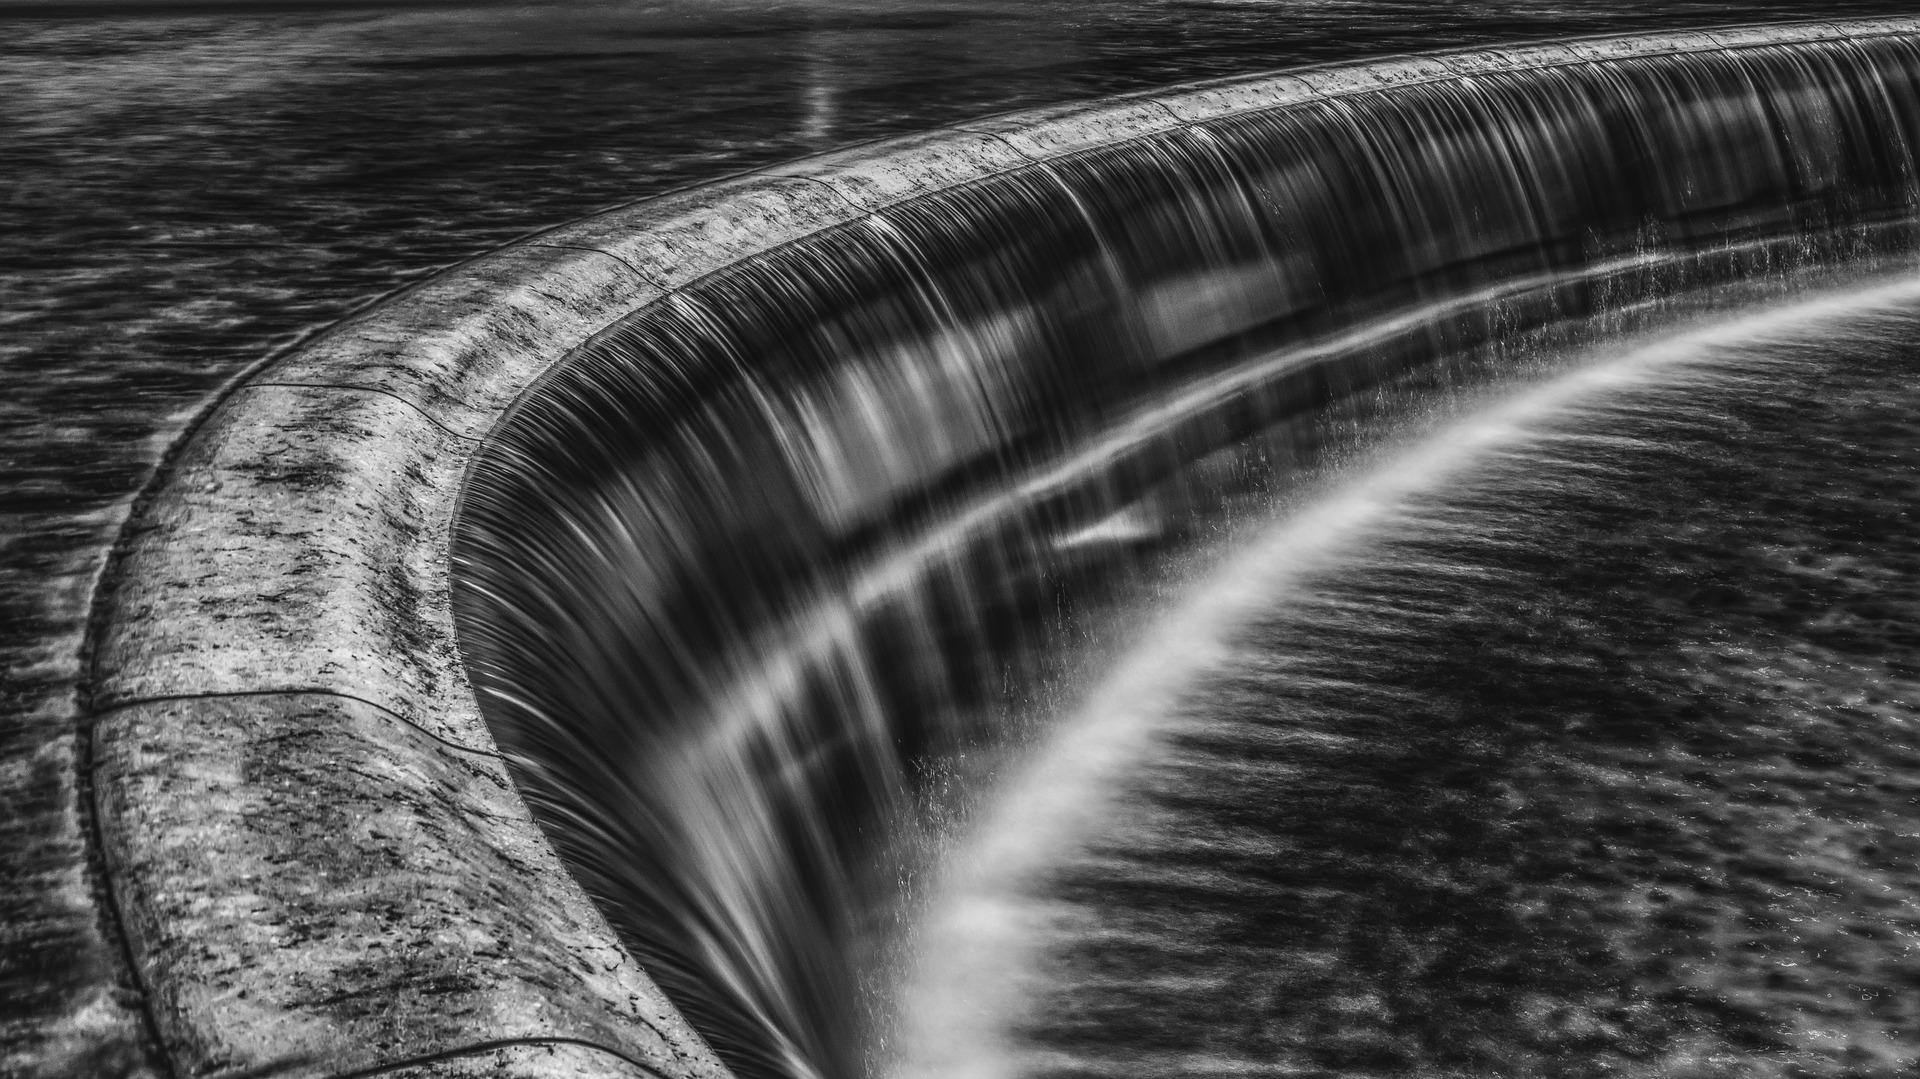 waterfall-2531194_1920